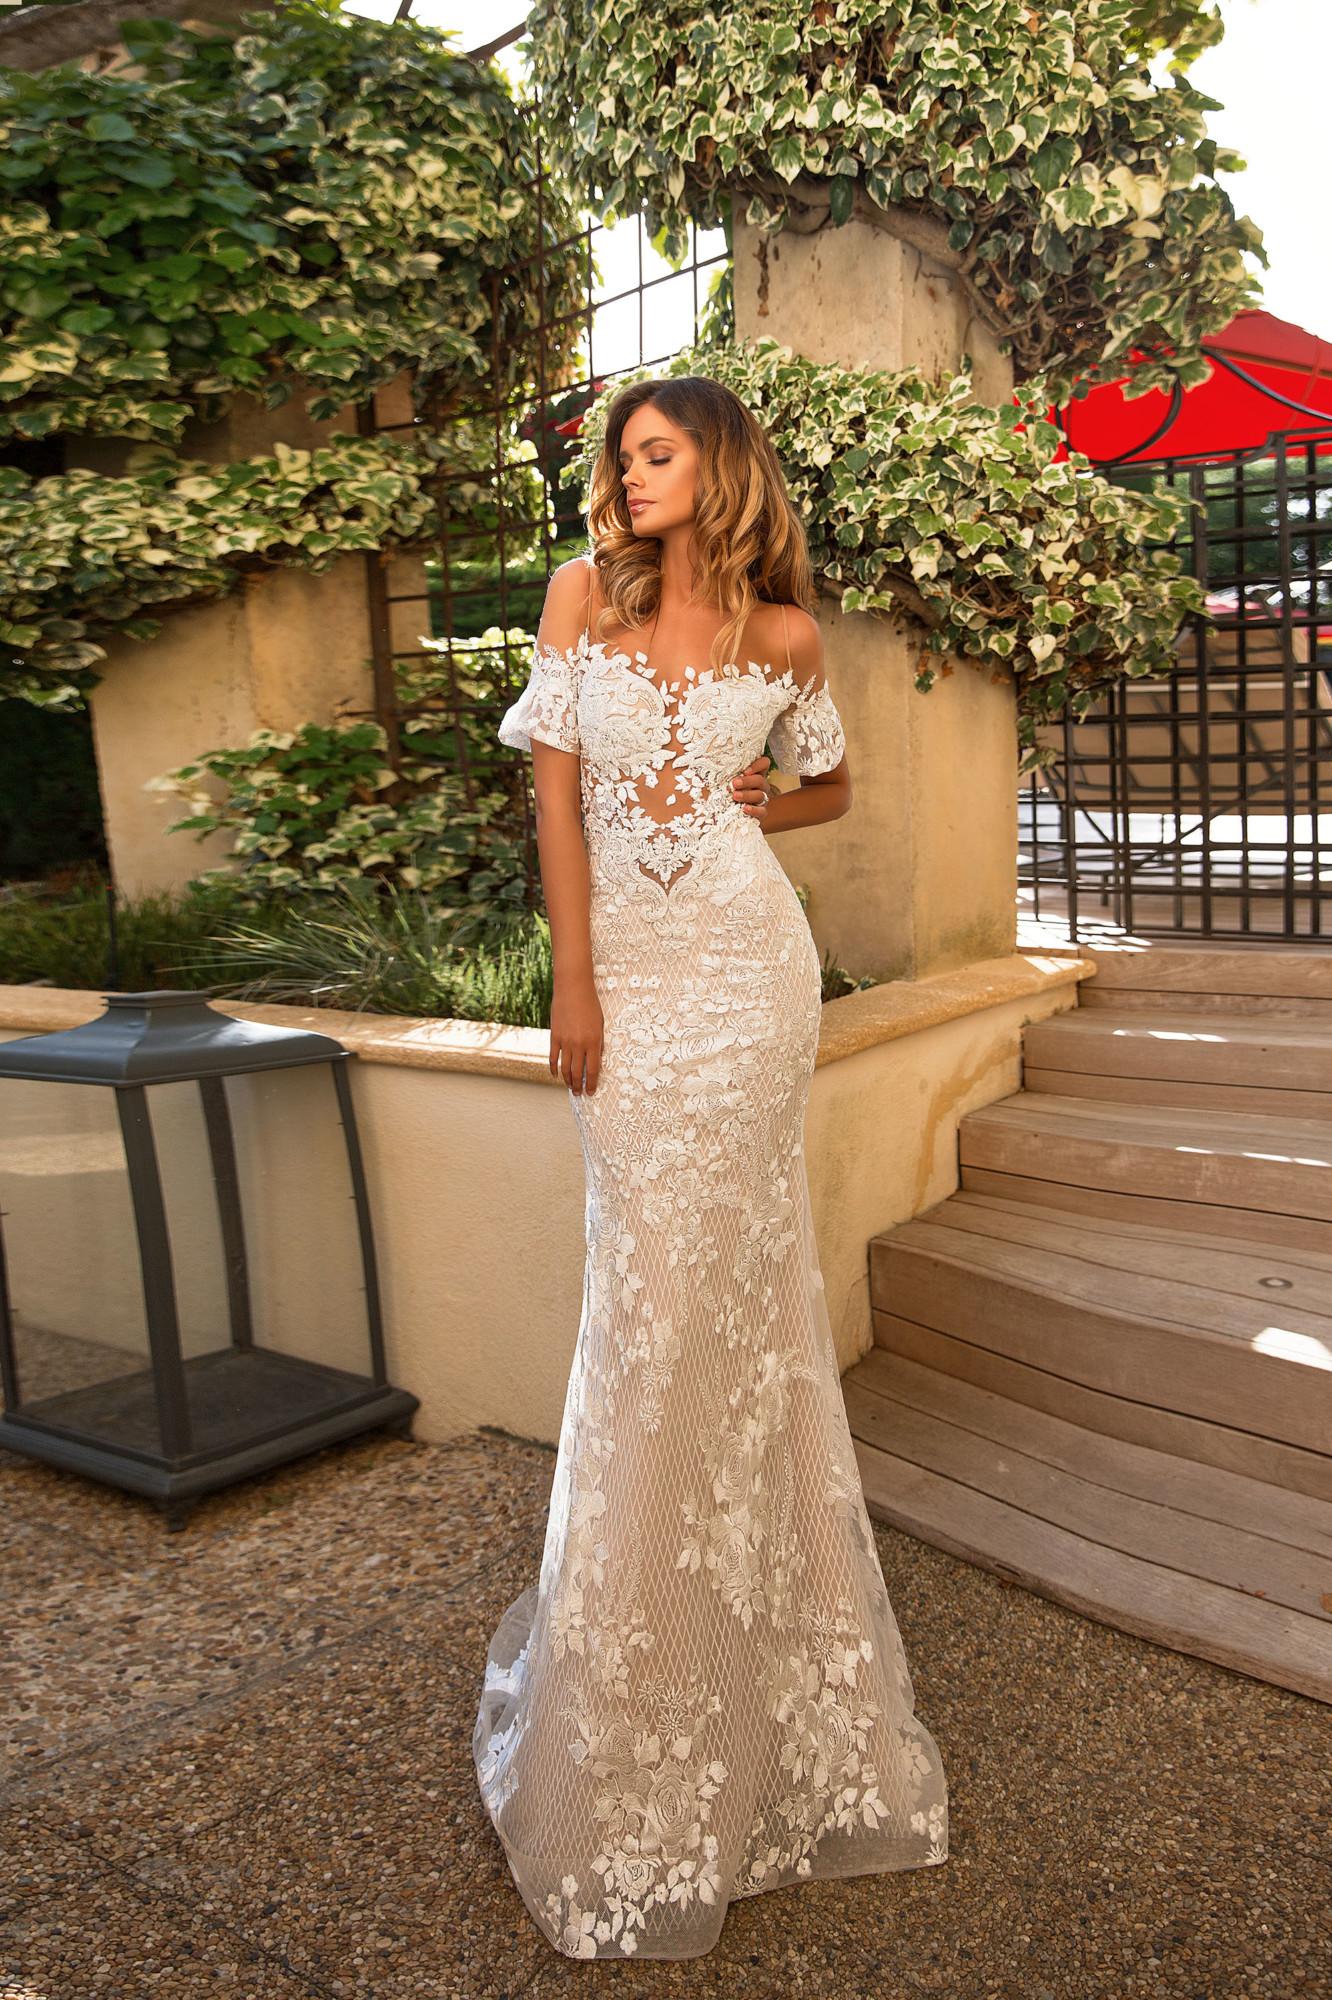 Nata By Milla Nova Available At I Do Wedding This Spring 283 Tremont St Boston Ma 02116 Ww Wedding Dresses Milla Nova Wedding Dresses Wedding Dresses 2018